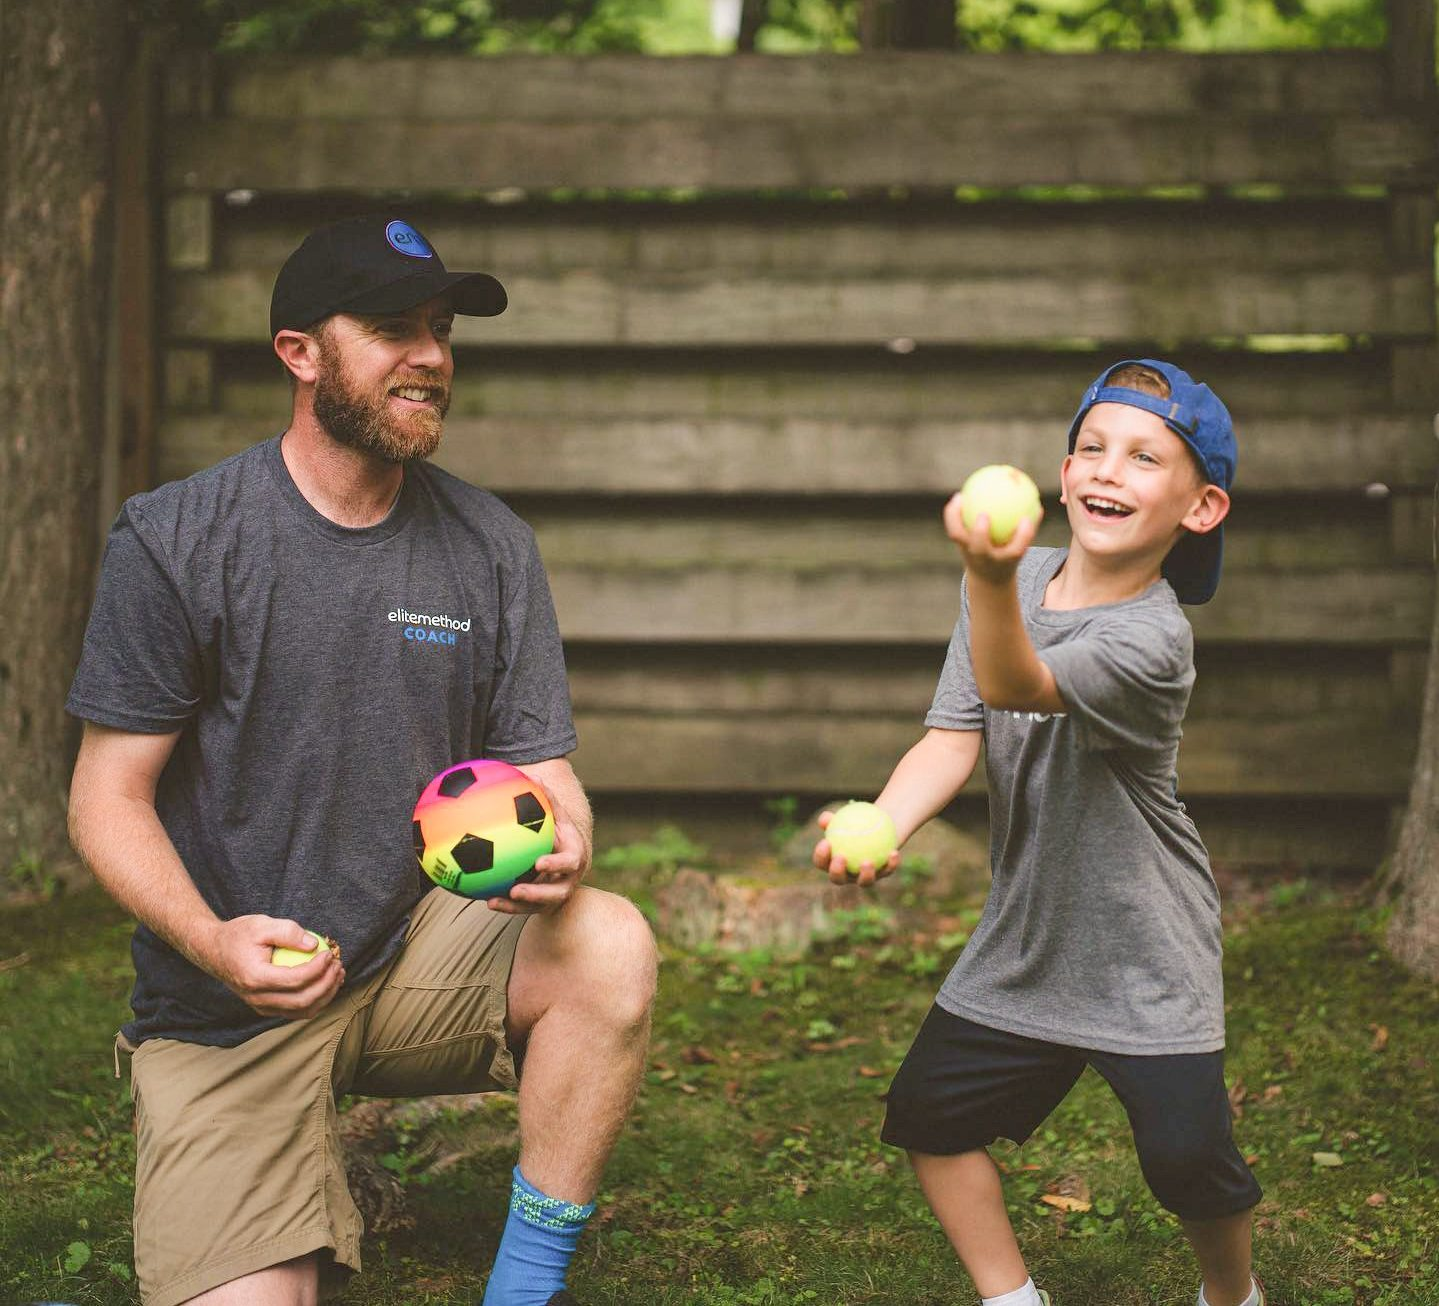 Keeping Kids Engaged with Elite Method